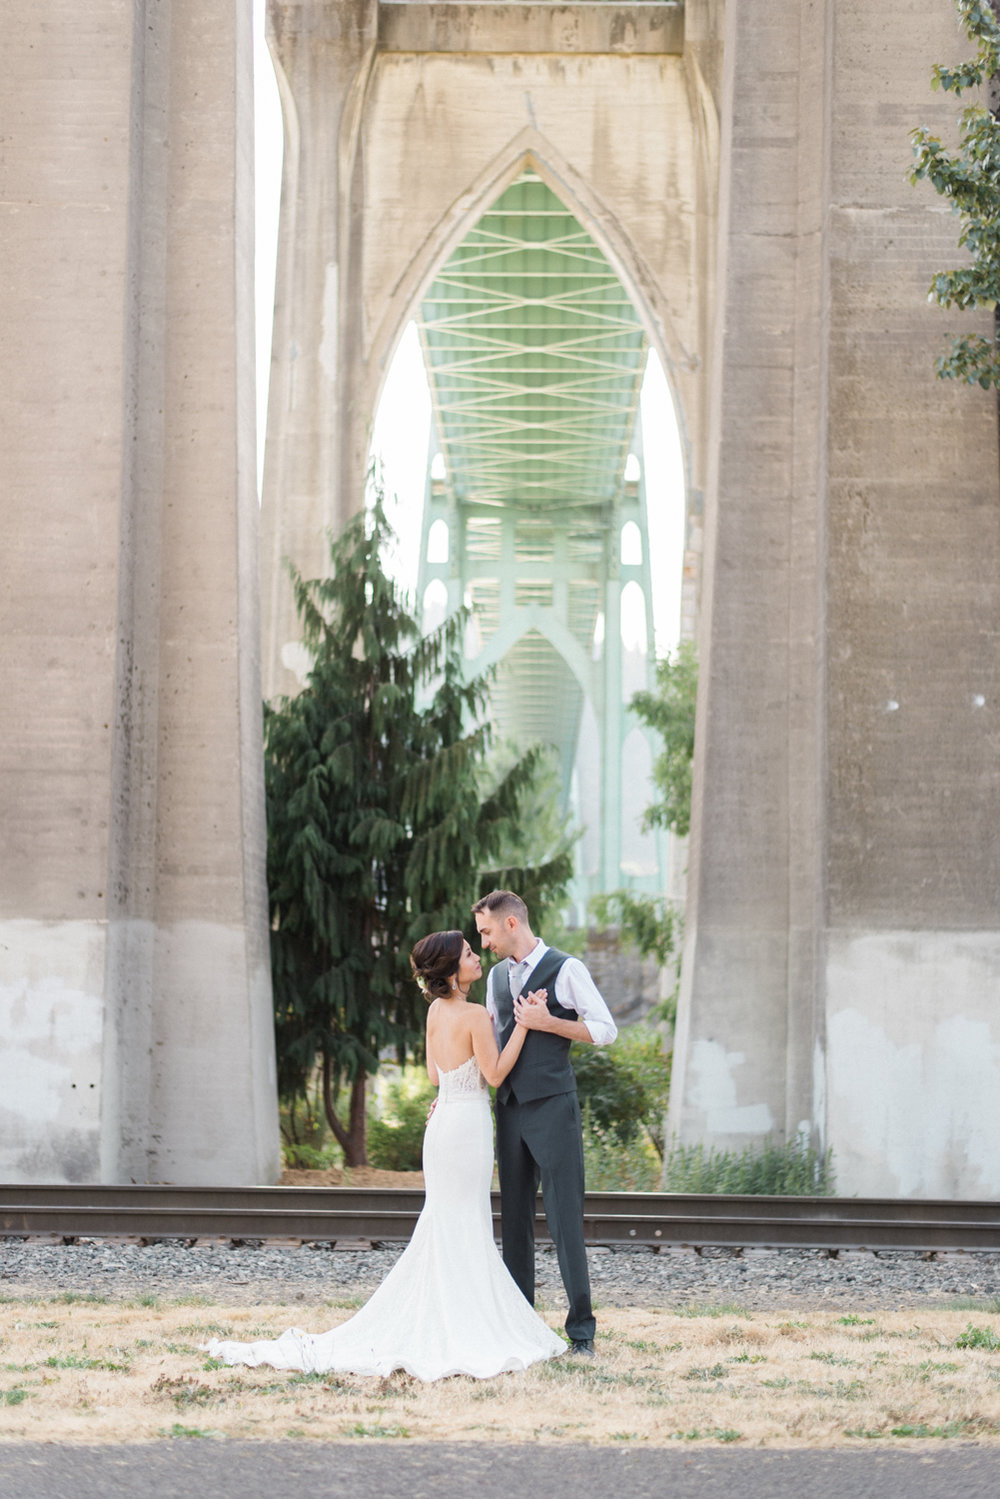 cathedral-park-wedding-st-johns-bridge-portland-shelley-marie-photo-2.jpg